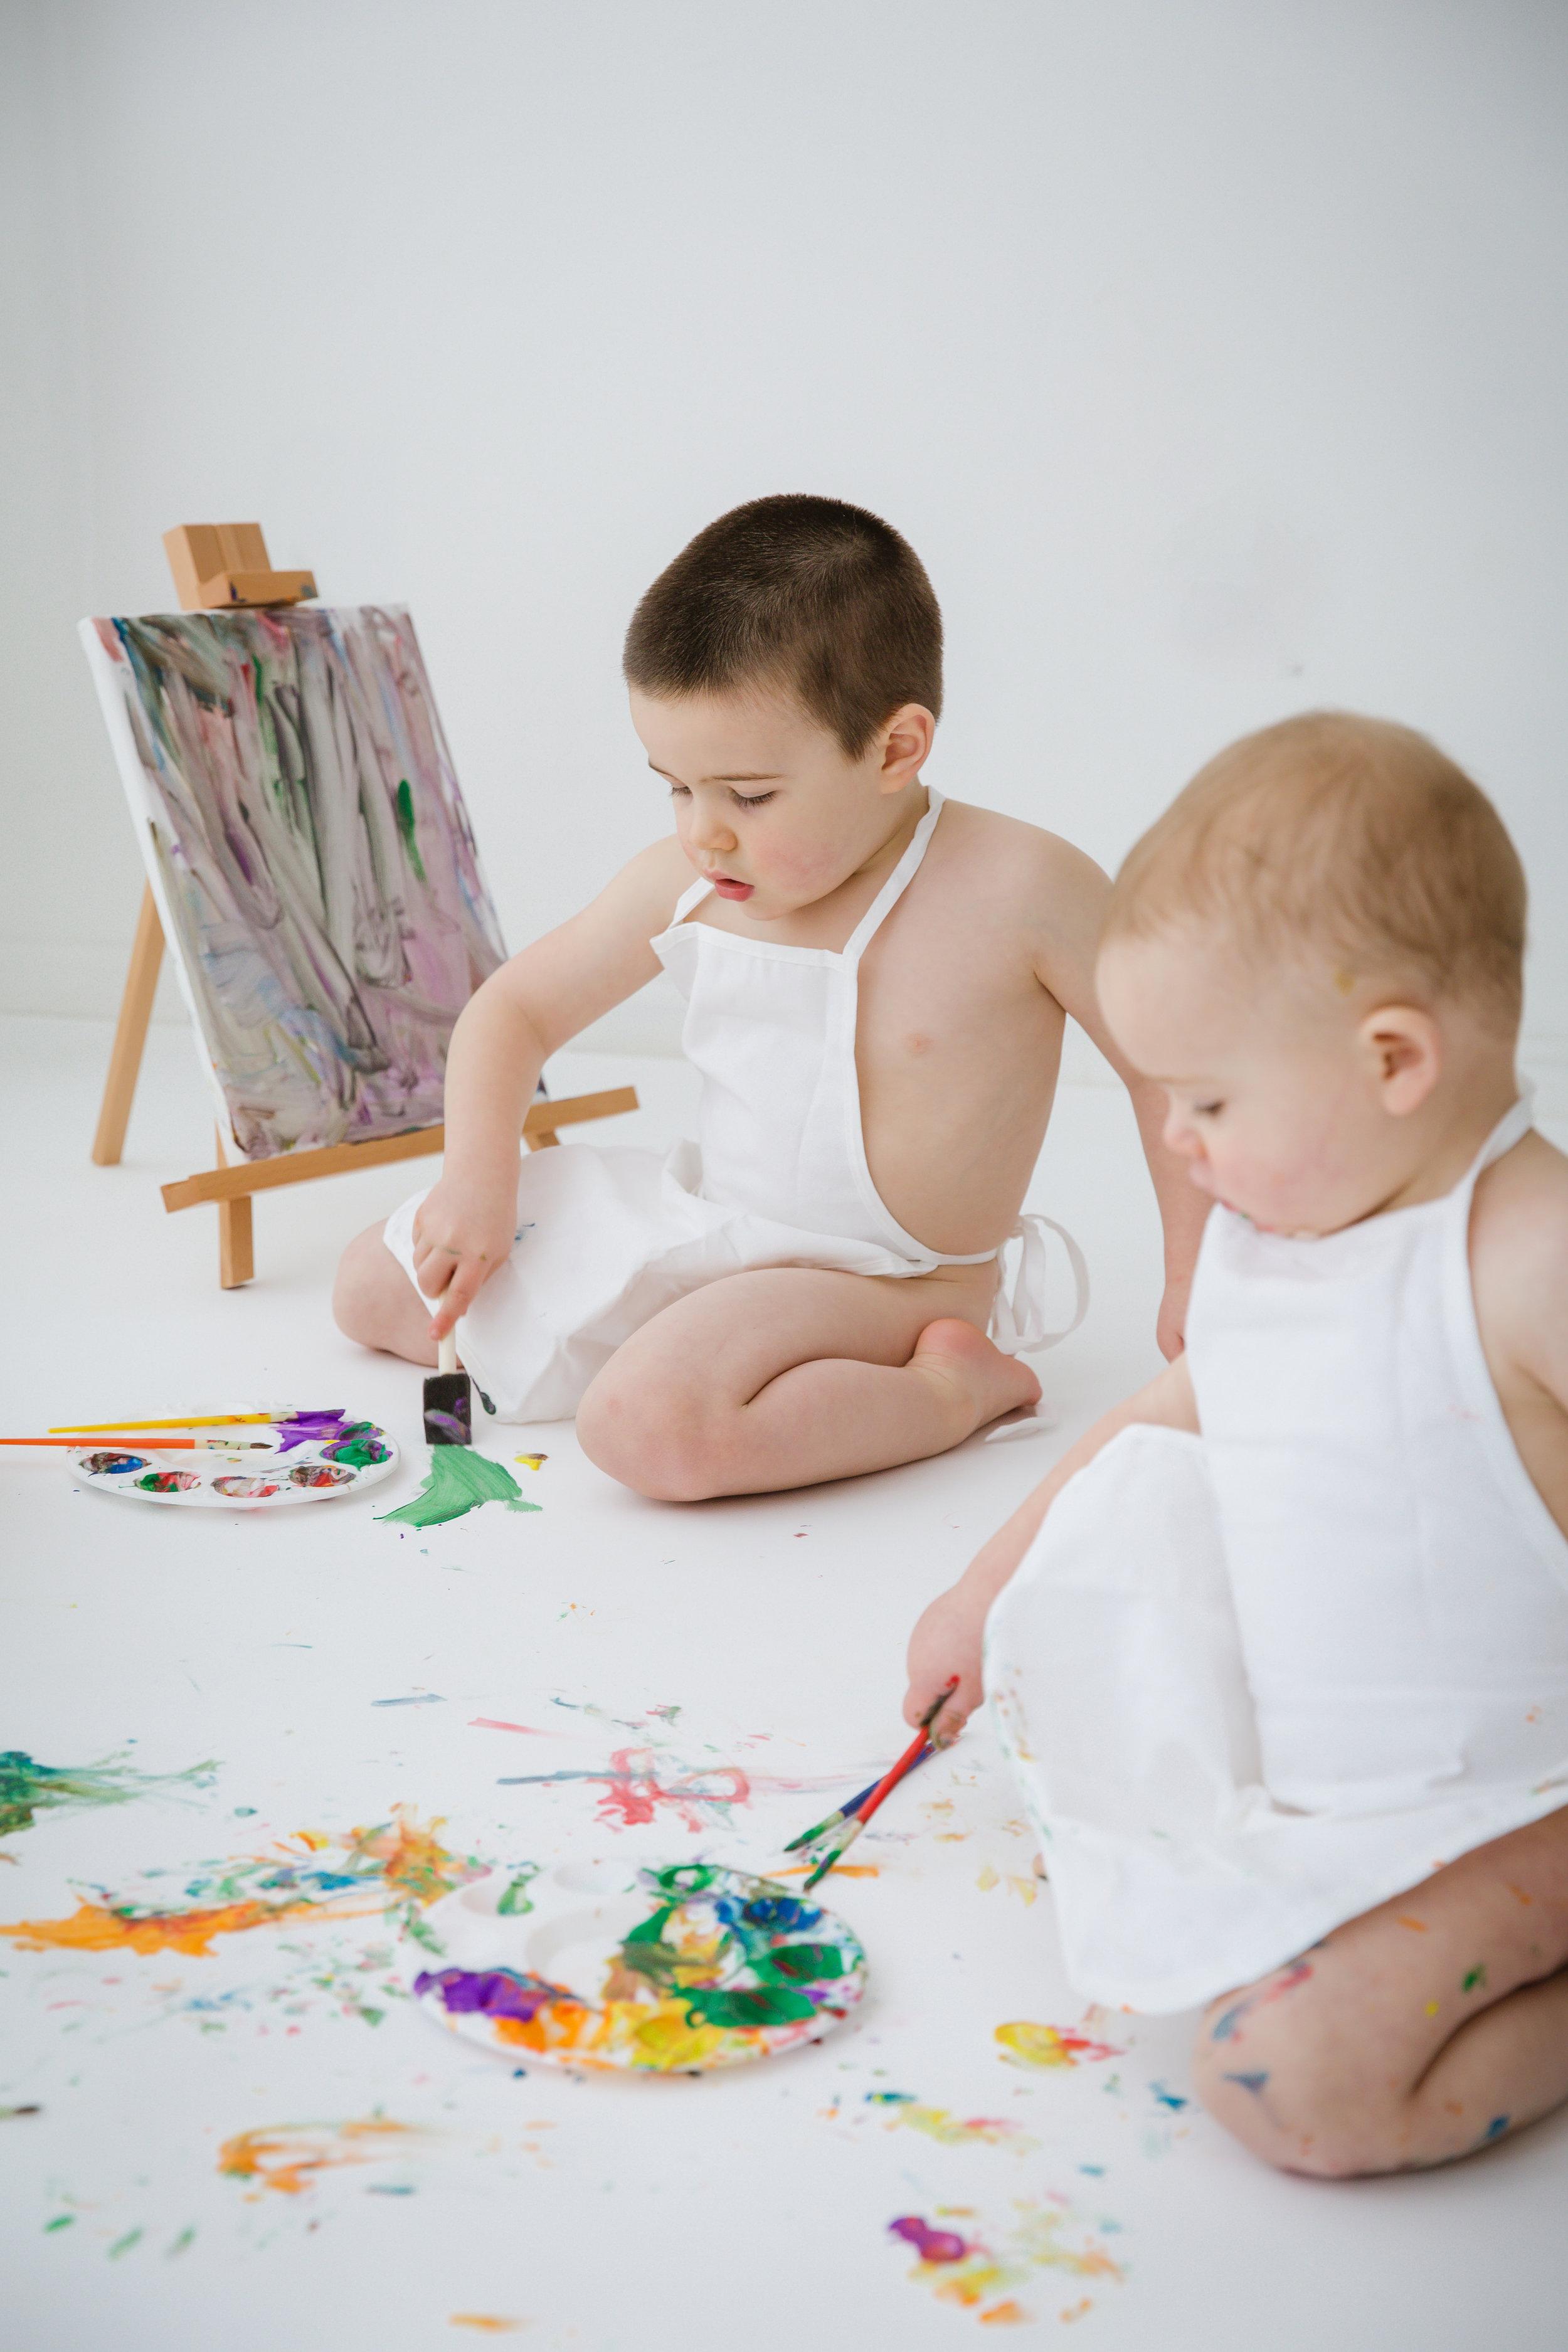 baby-boys-painting-in-burlington-new-jersey-photo-studio